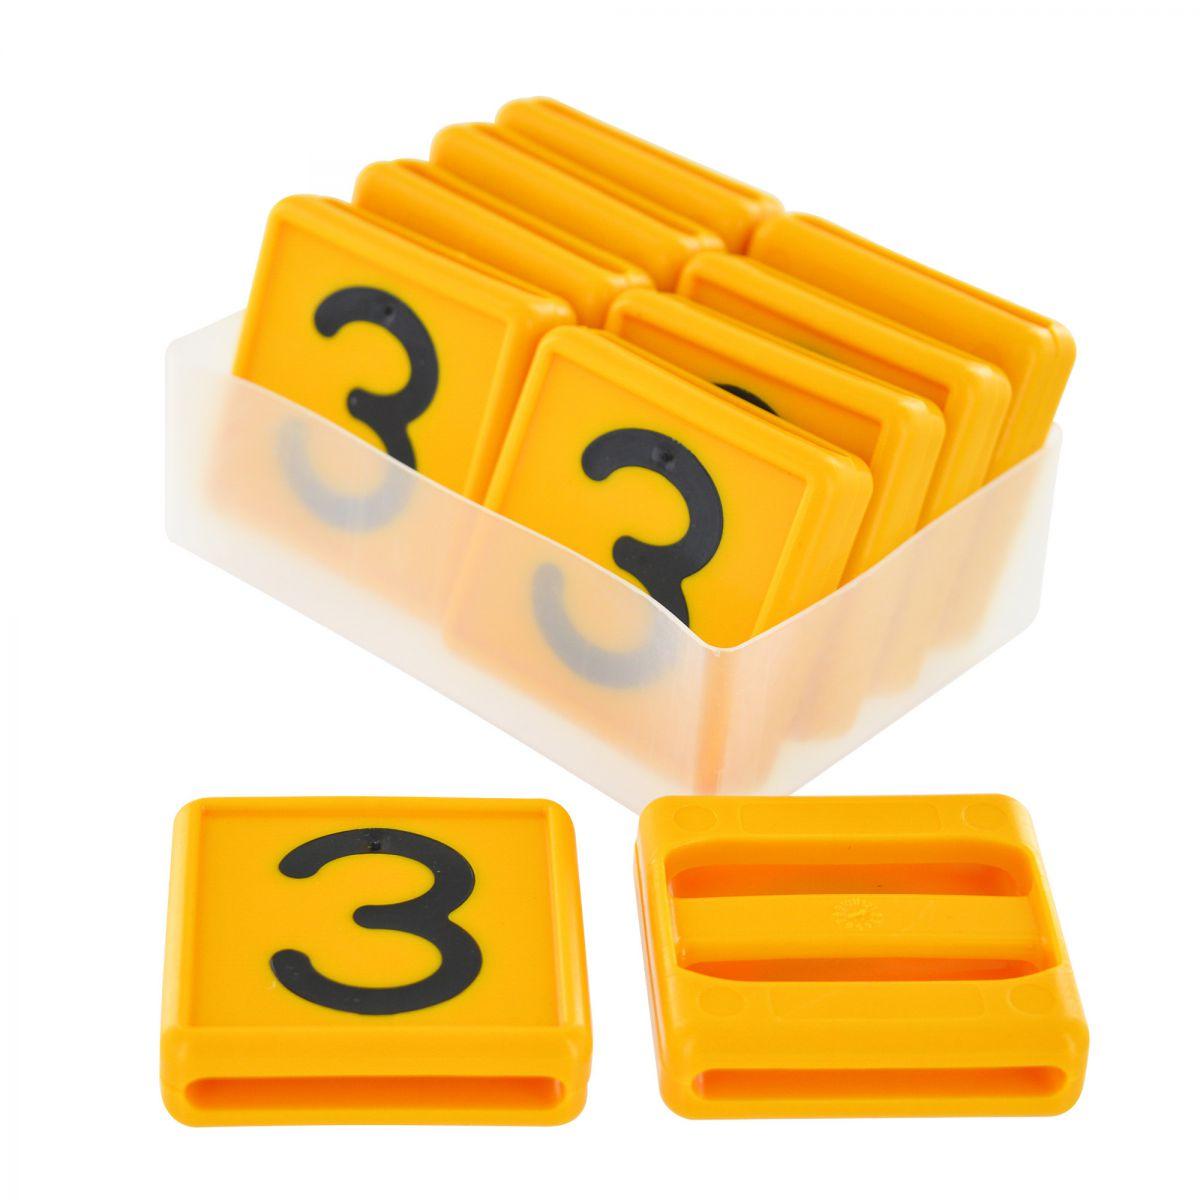 nummer 3 fr kuhhalsband 10 stck im karton gelb 48x46mm